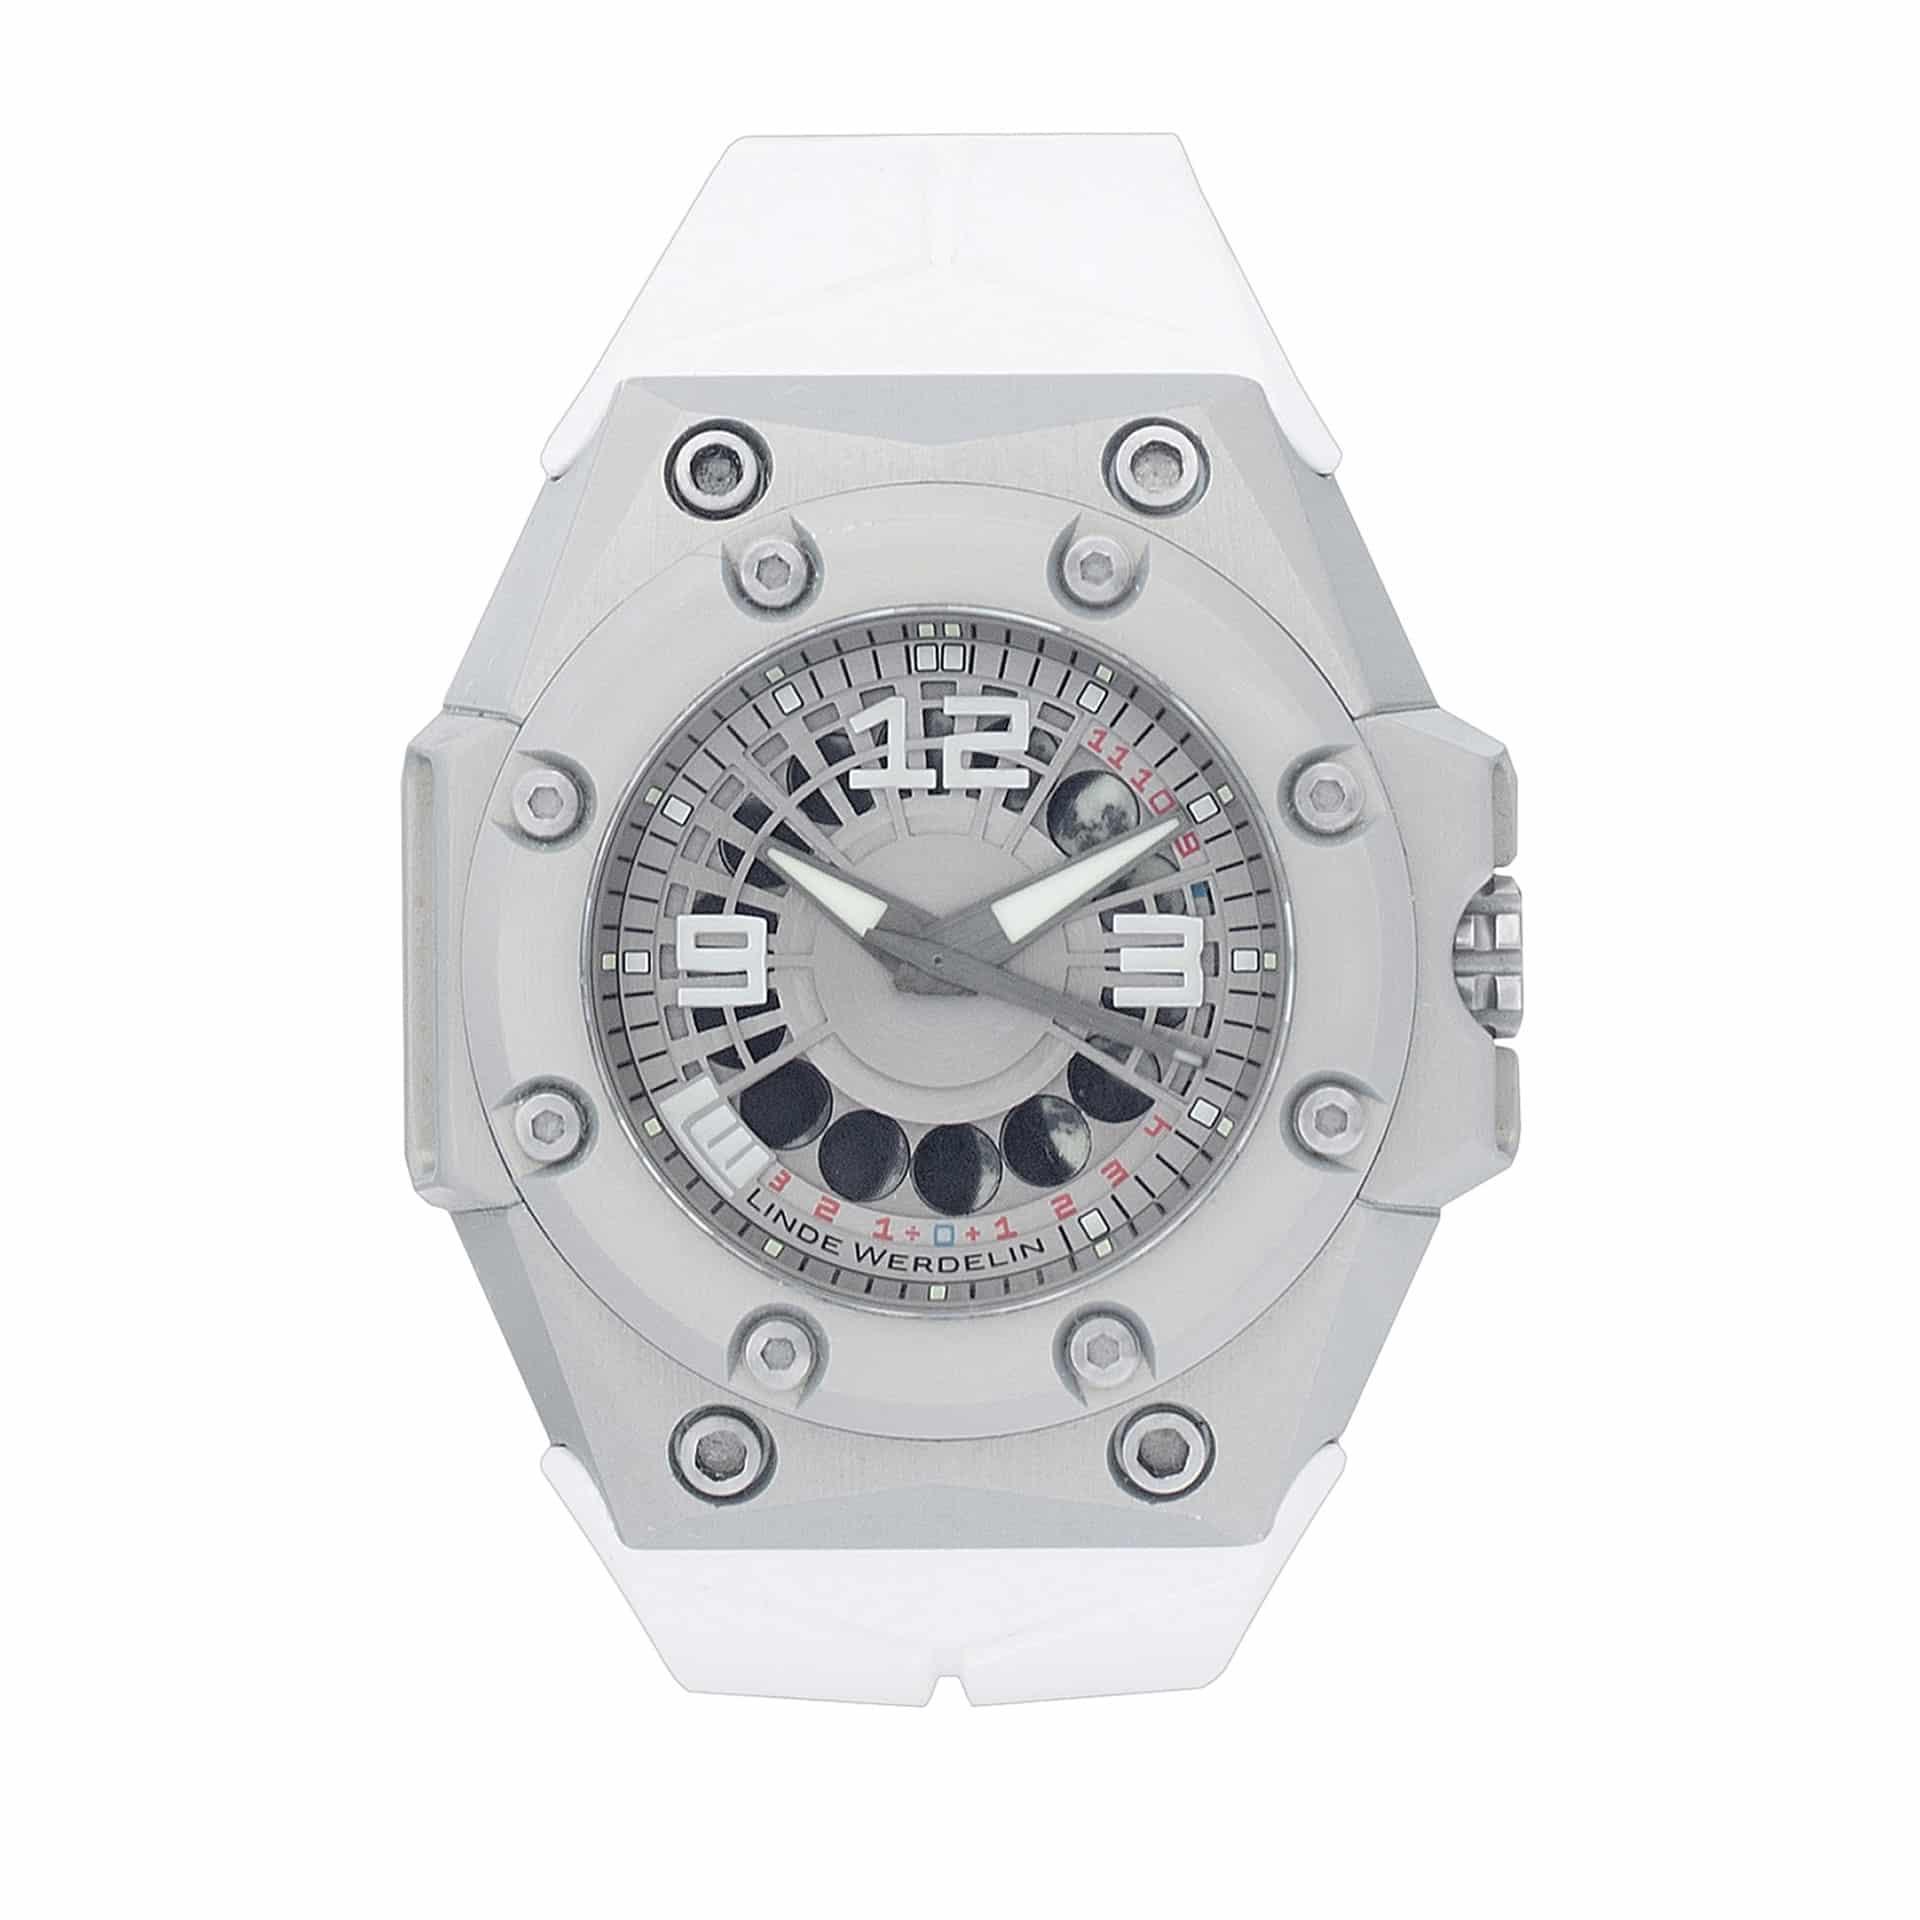 Linde Werdelin Oktopus watch